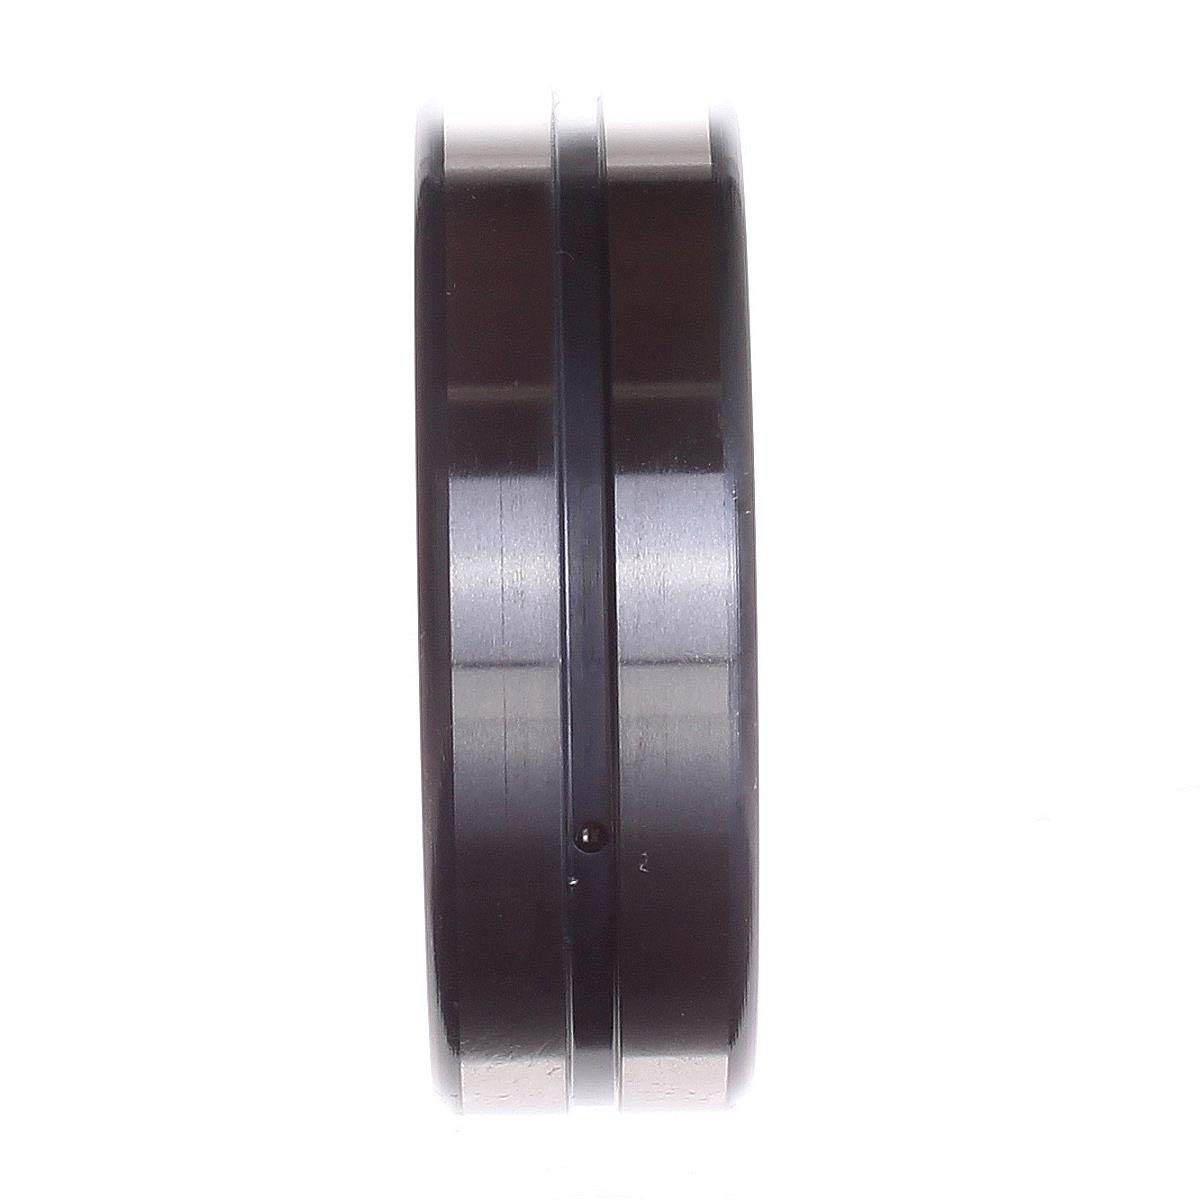 WS22211-E1-XL-2RSR FAG Spherical Roller Bearing 55,00x100,00x31,00mm